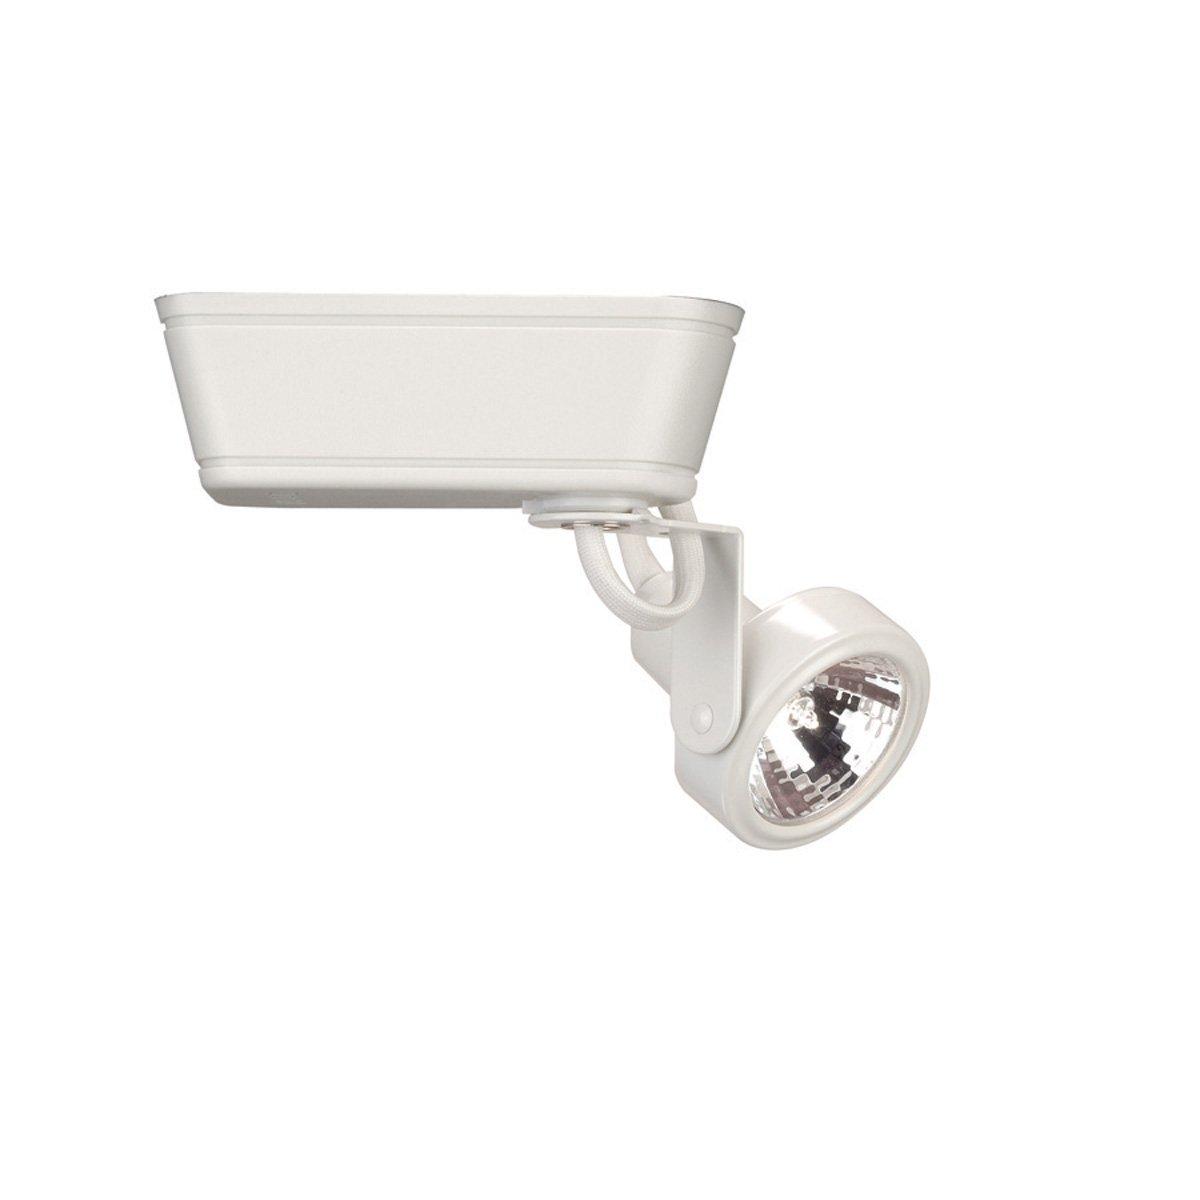 WAC Lighting HHT-160-WT H Series Low Voltage Track Head, 50W